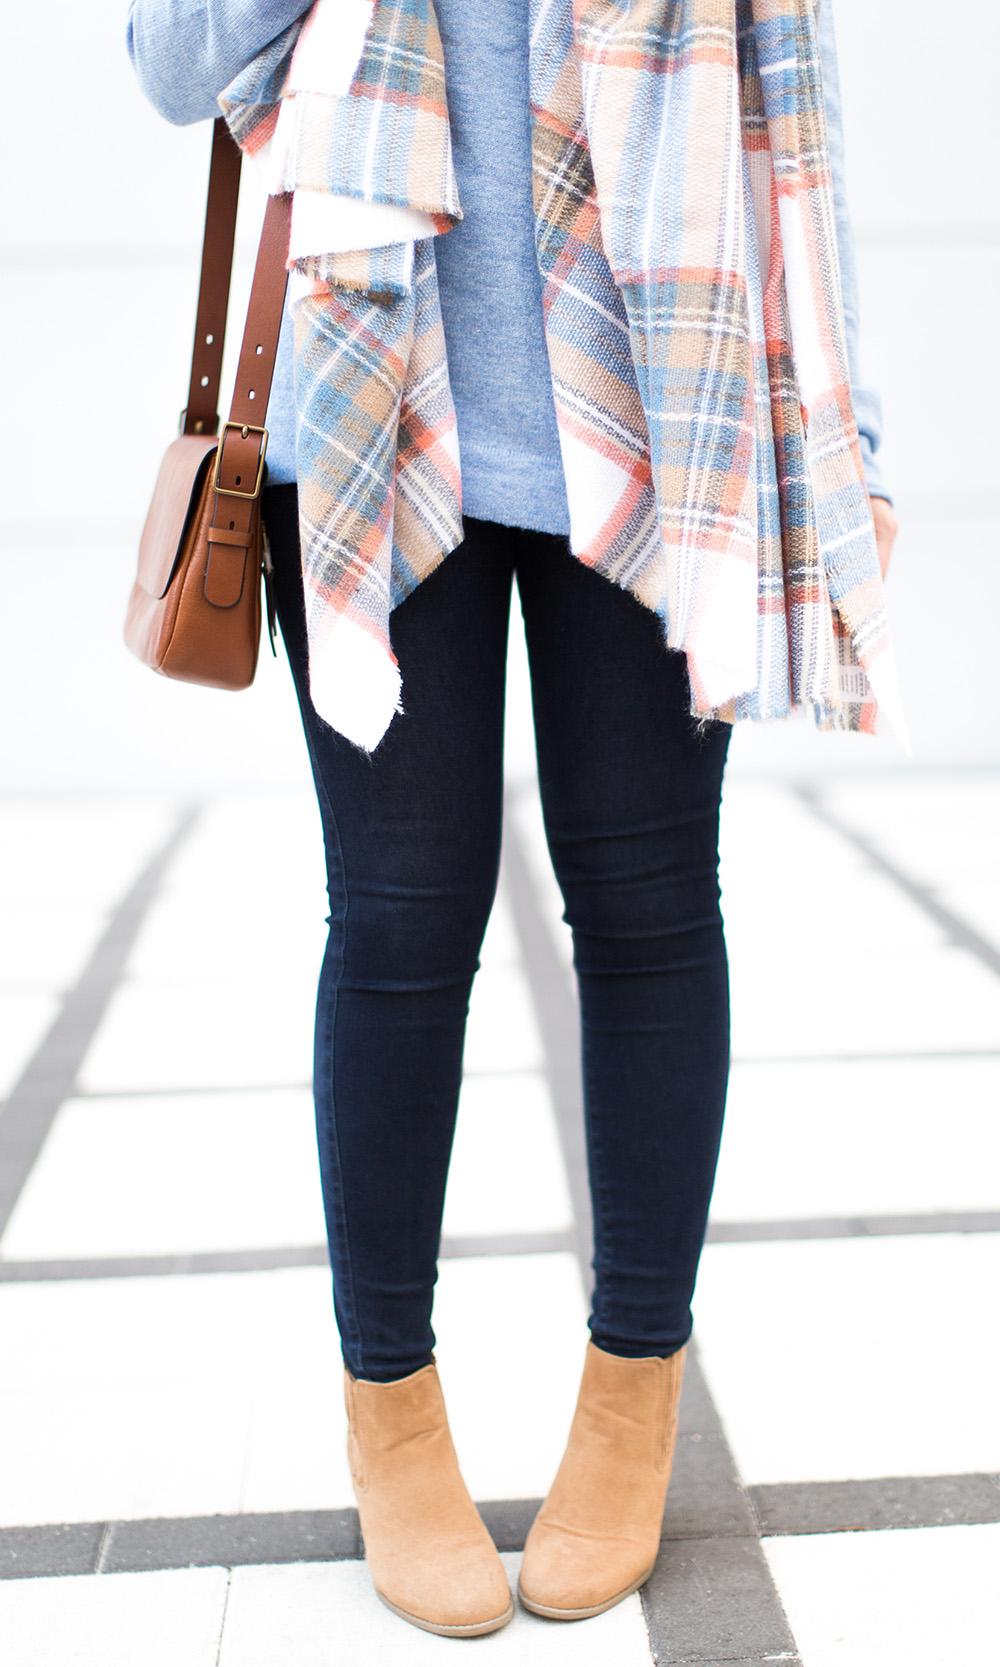 Winter Pale Blue Sweater + Plaid Scarf